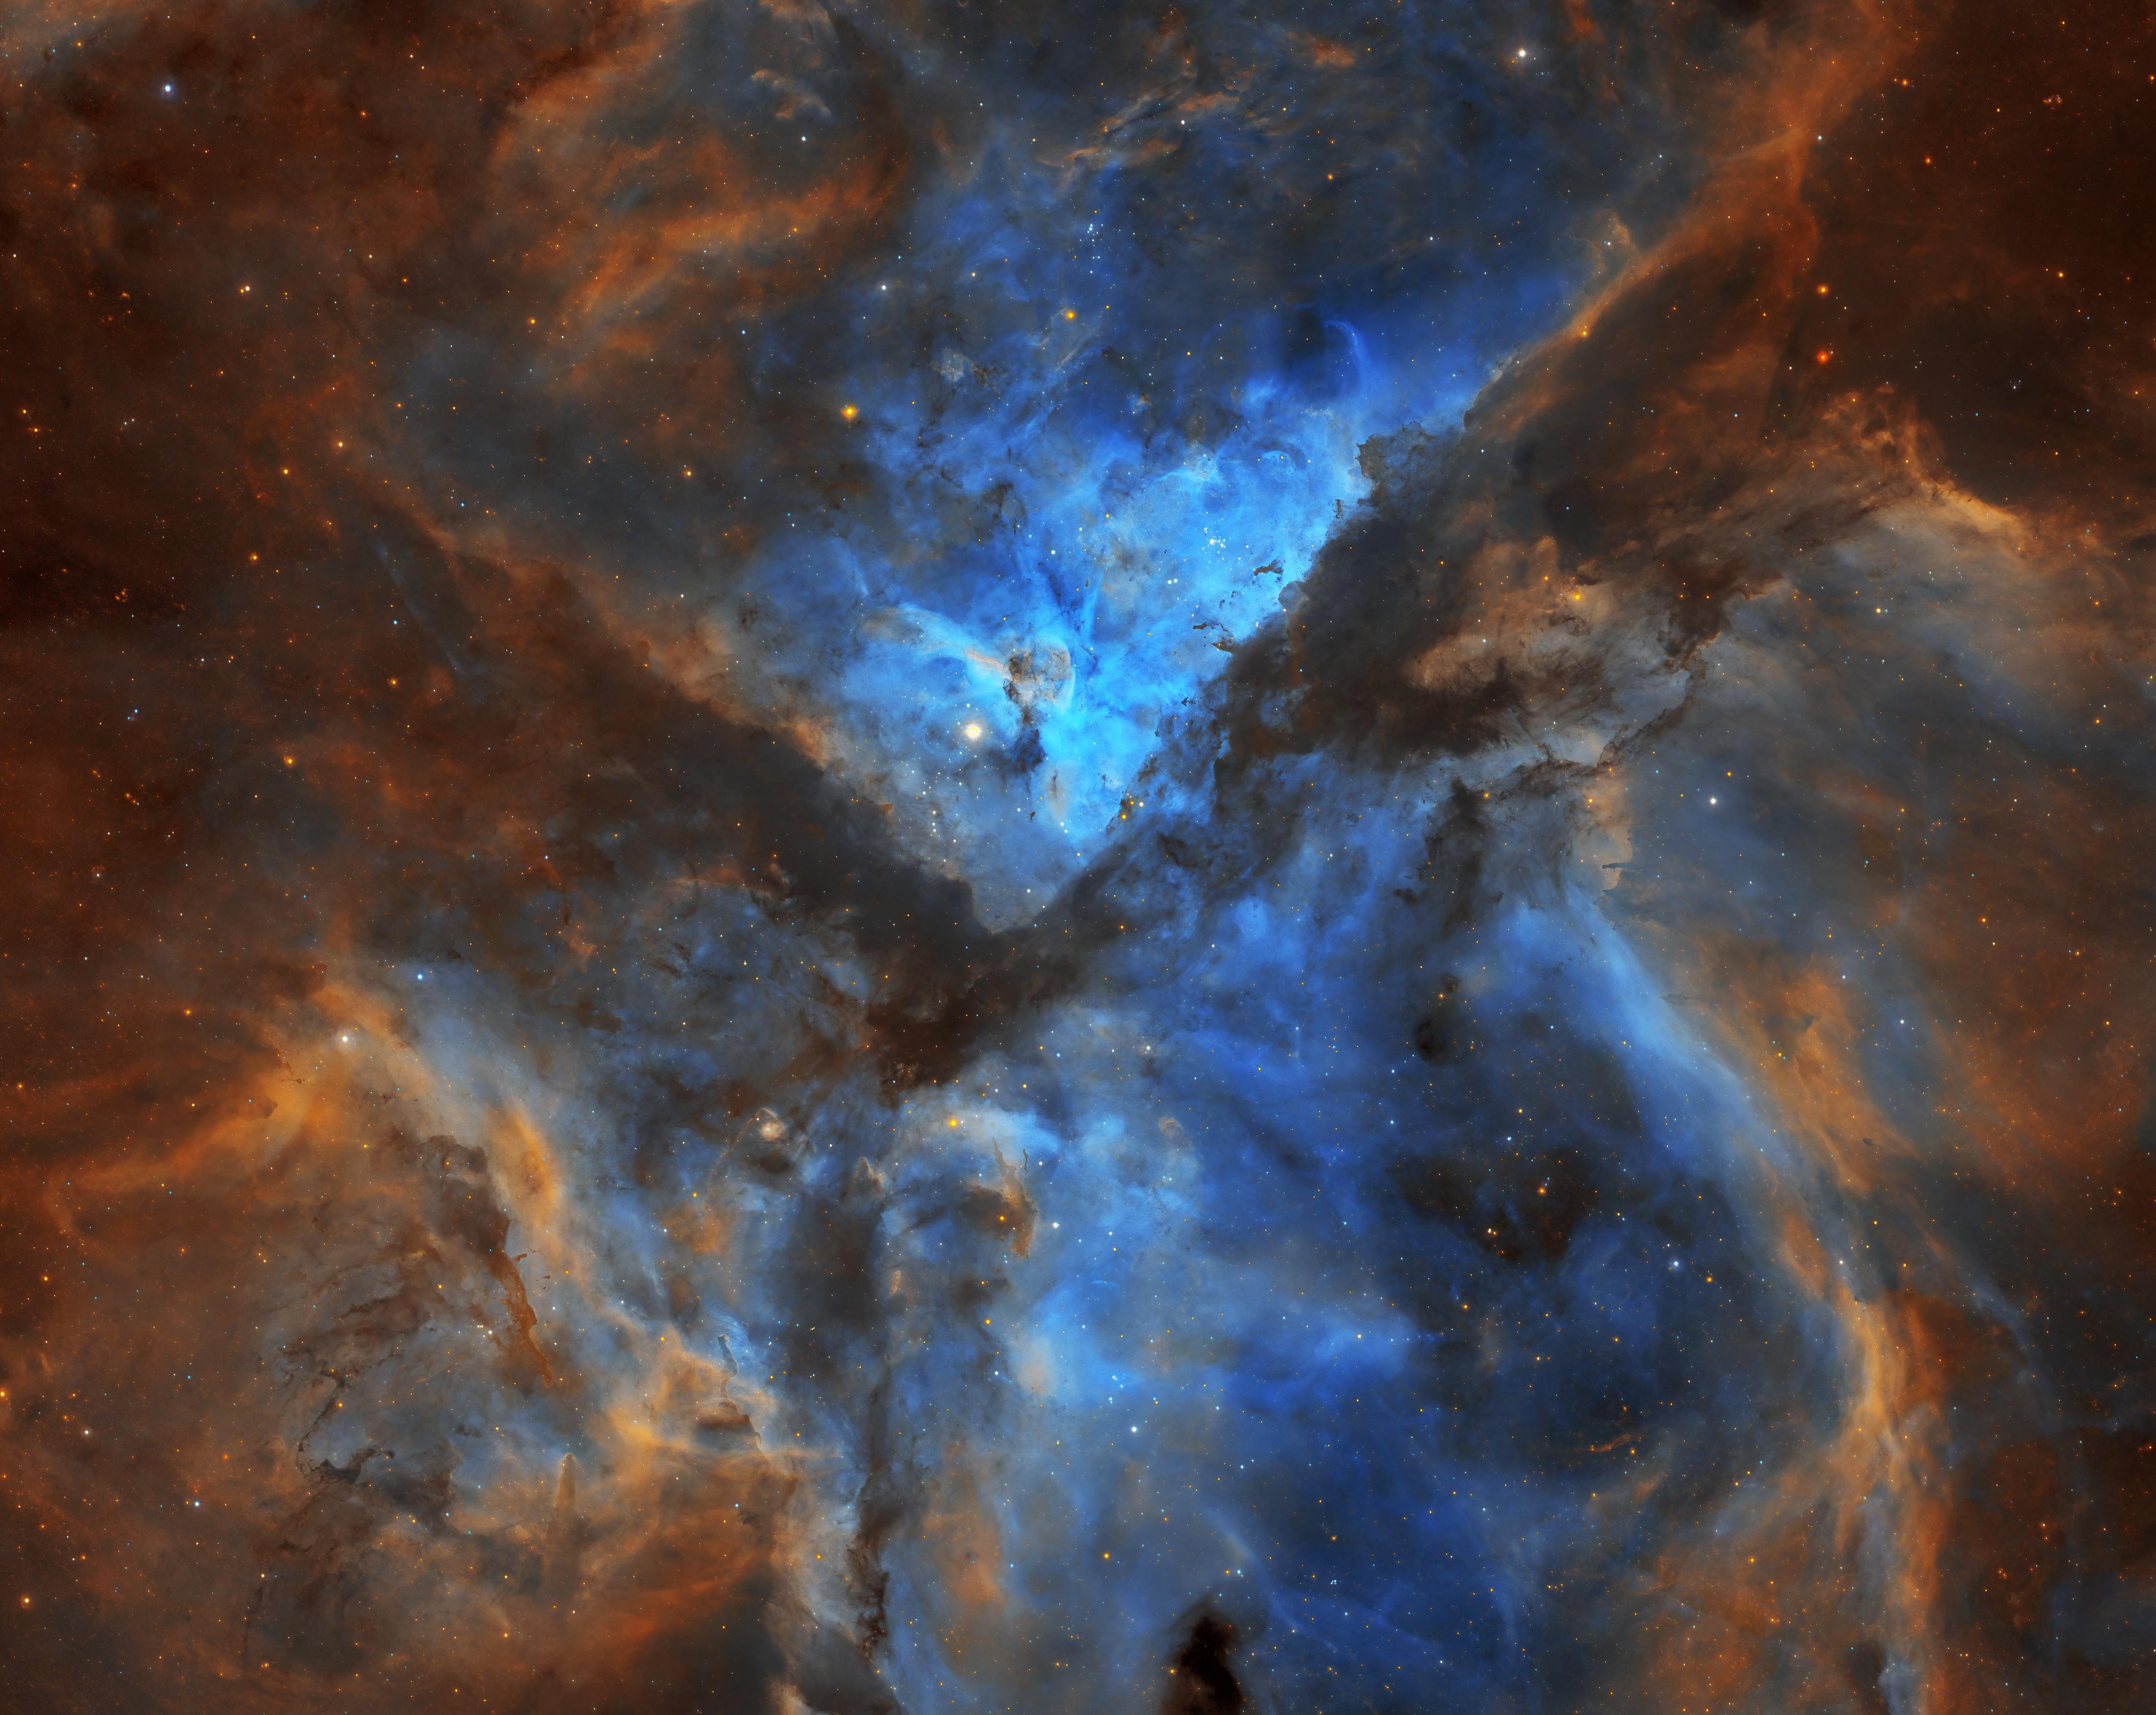 Carina Nebula SHO